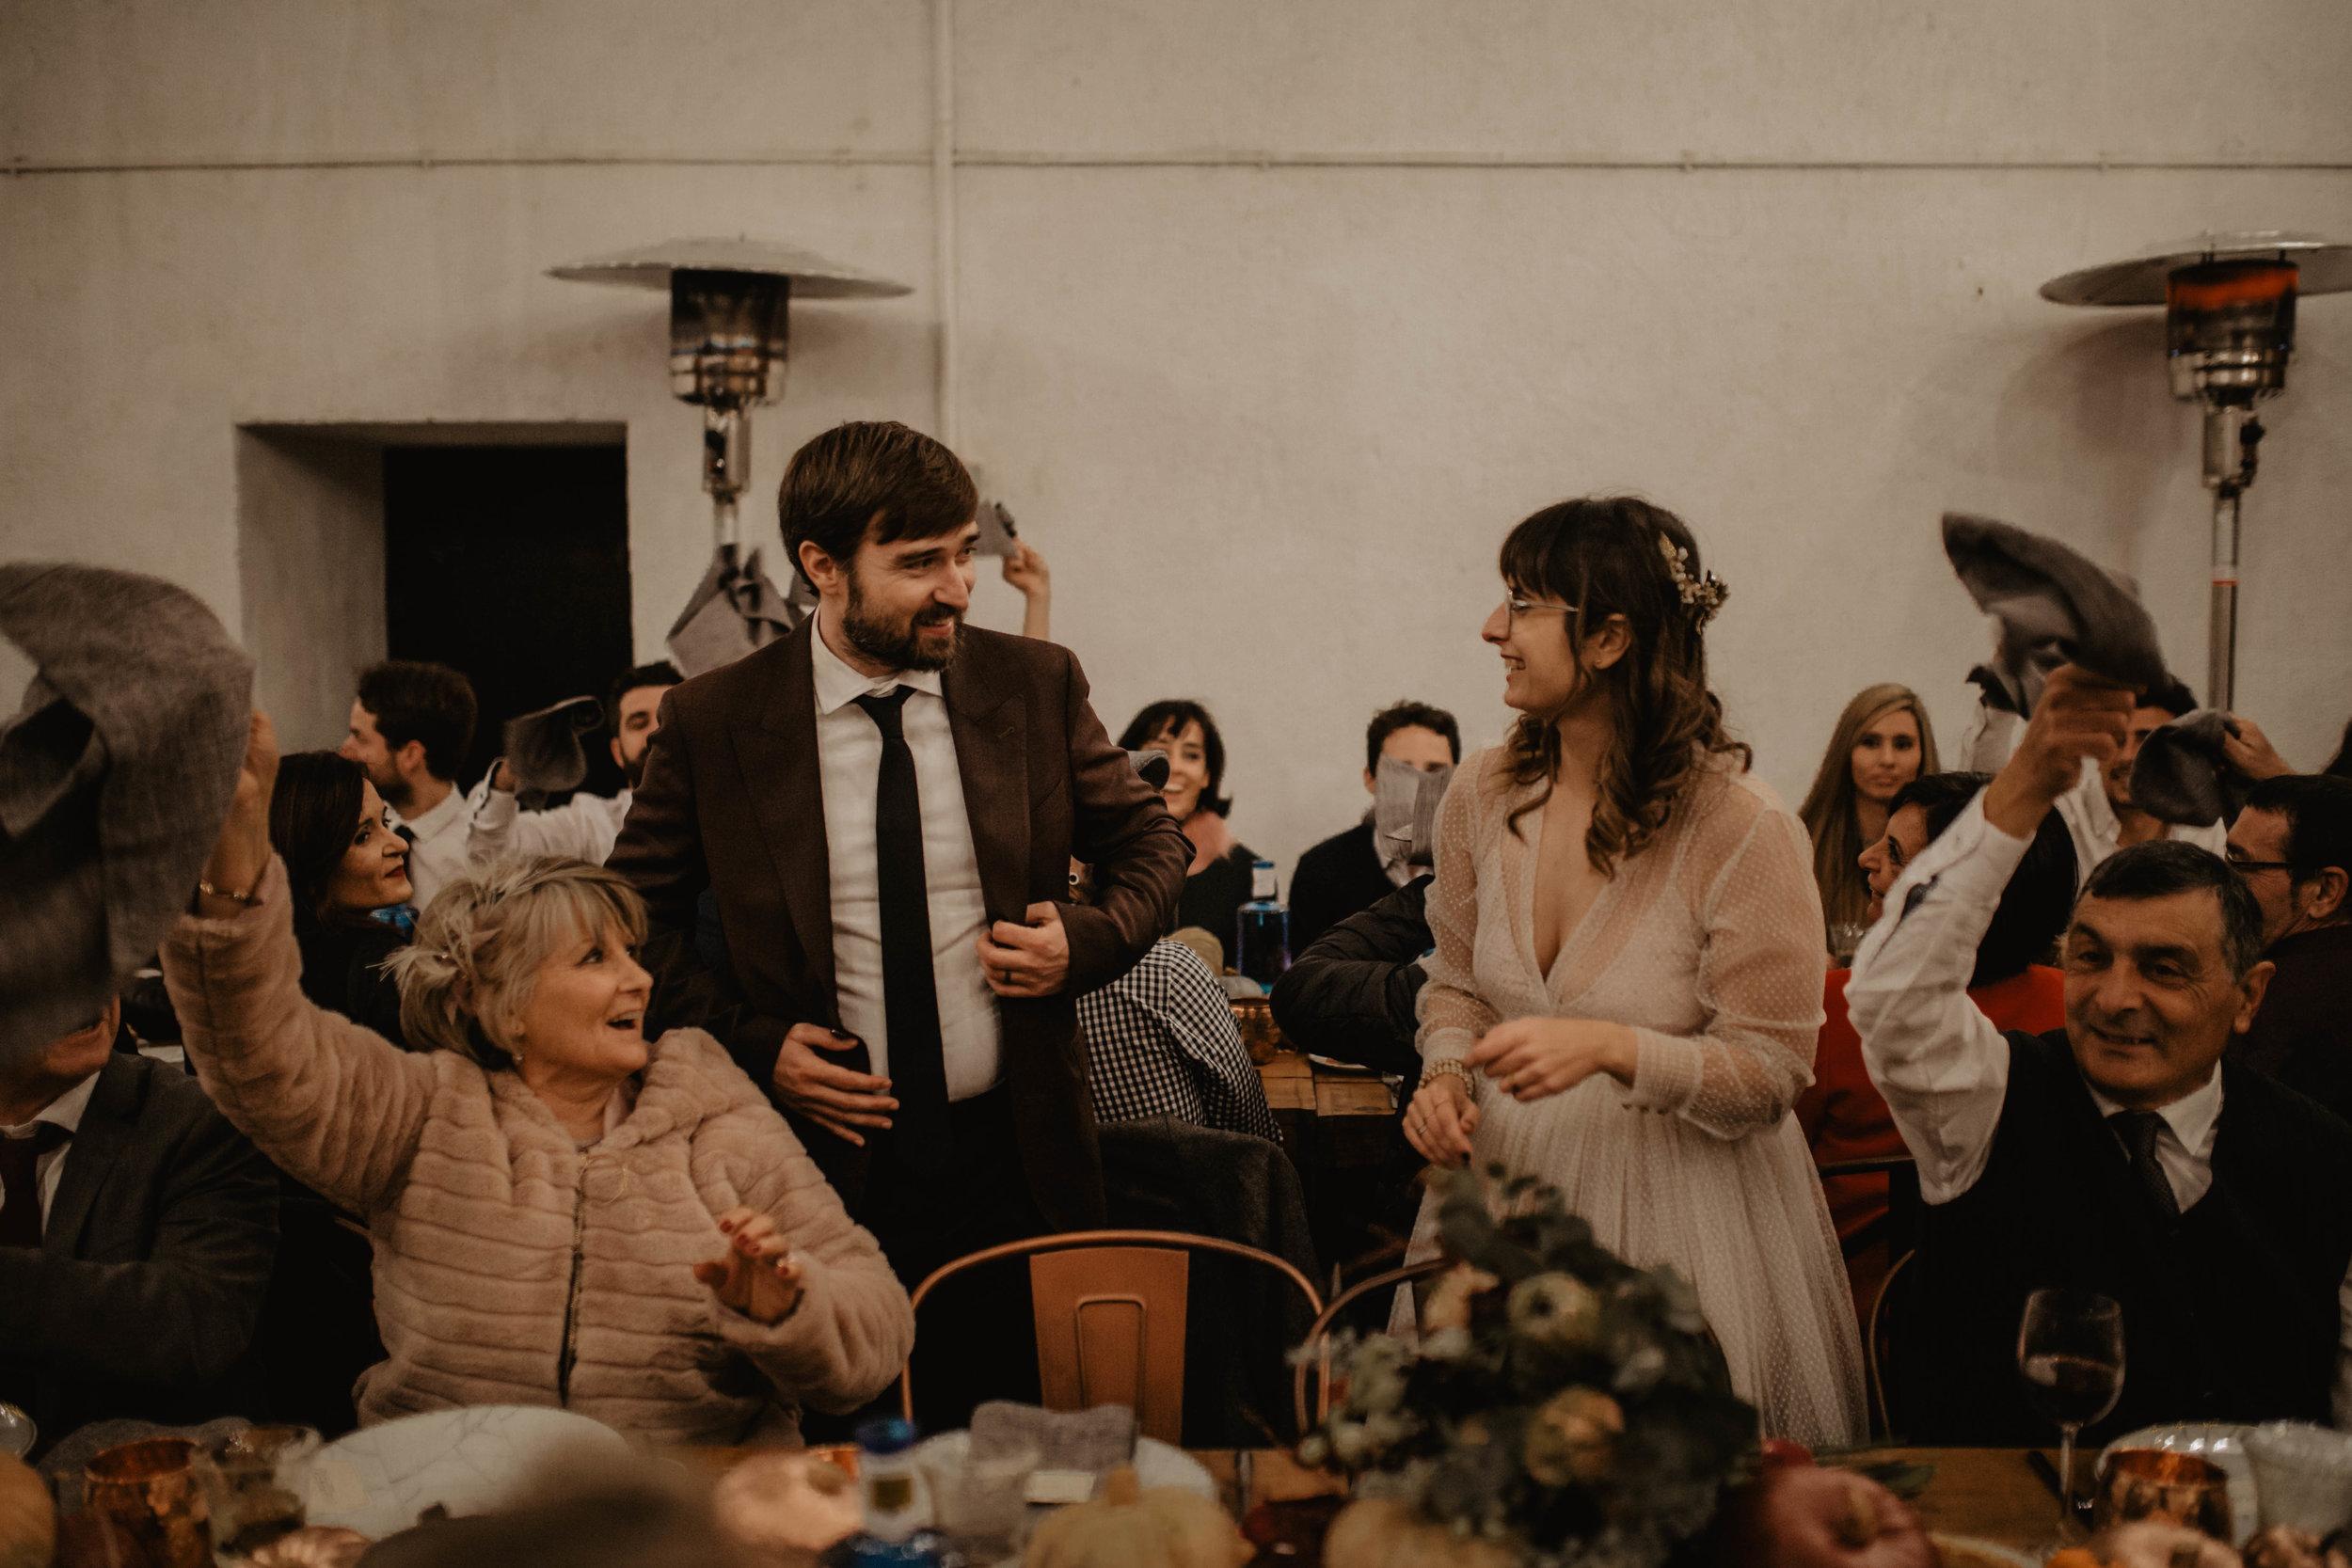 thenortherngirlphotography-photography-weddingphotography-couple-bodasconestilo-bodasenbarcelona-martadavid-829.jpg